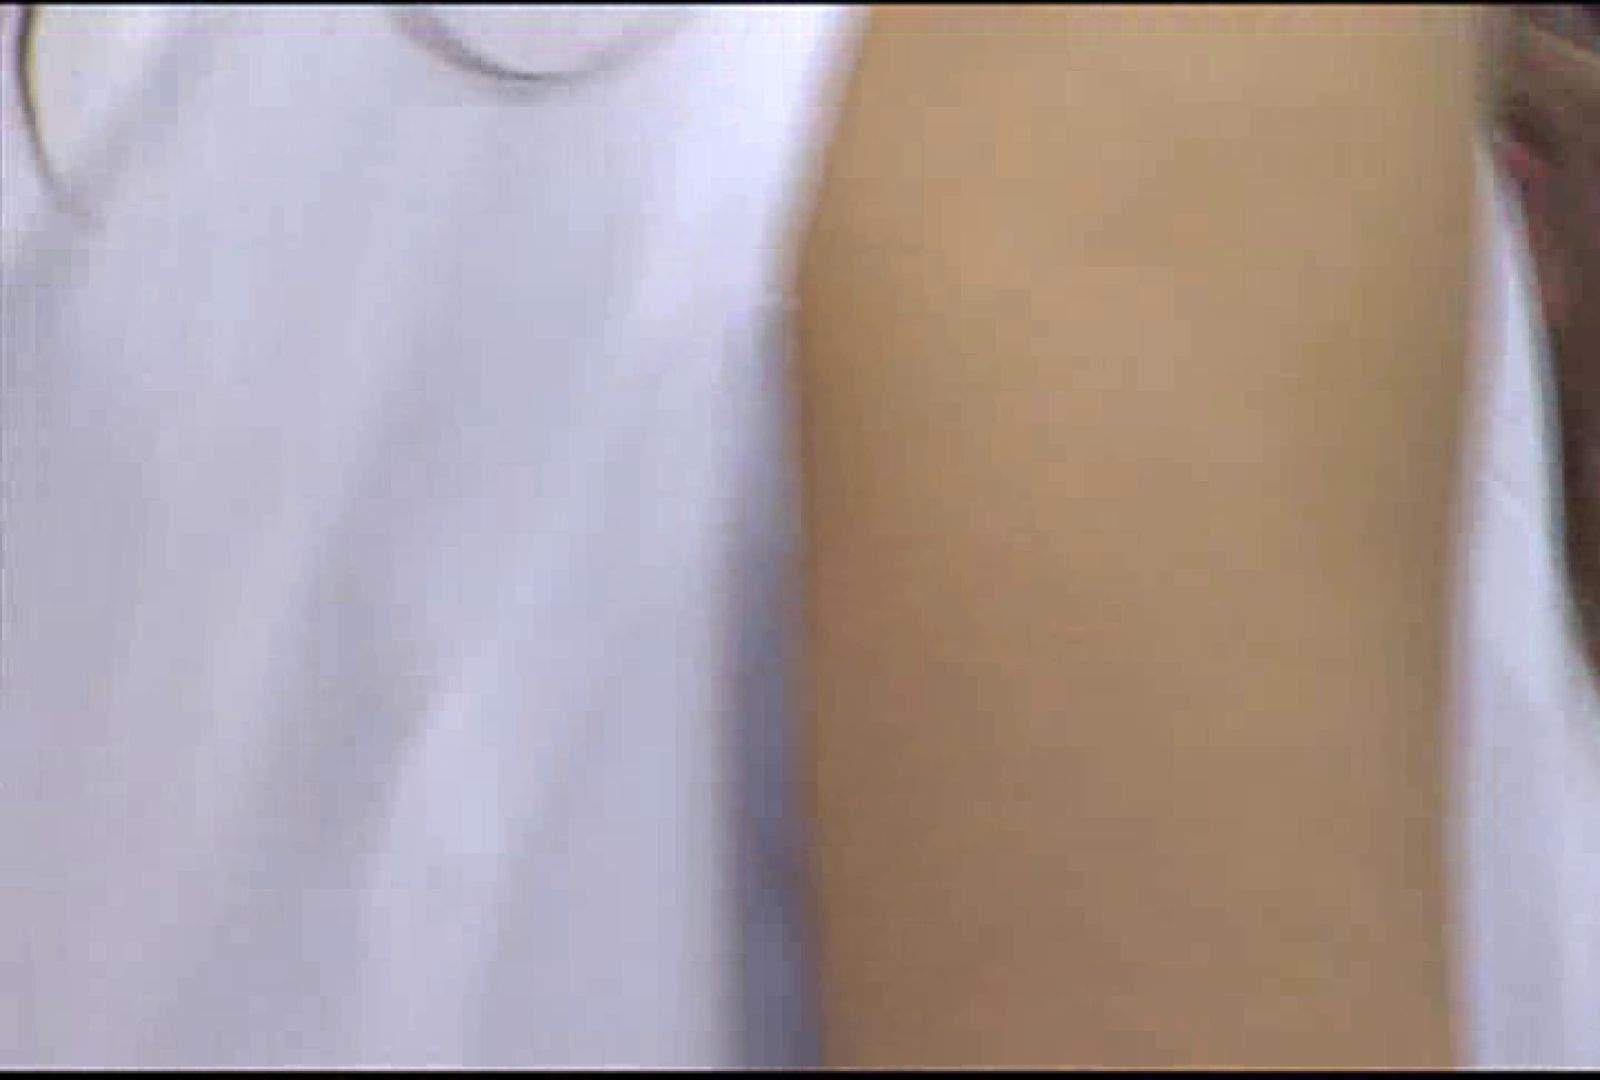 熱視線Vol.6 RQ OLの実態   乳首  64pic 17